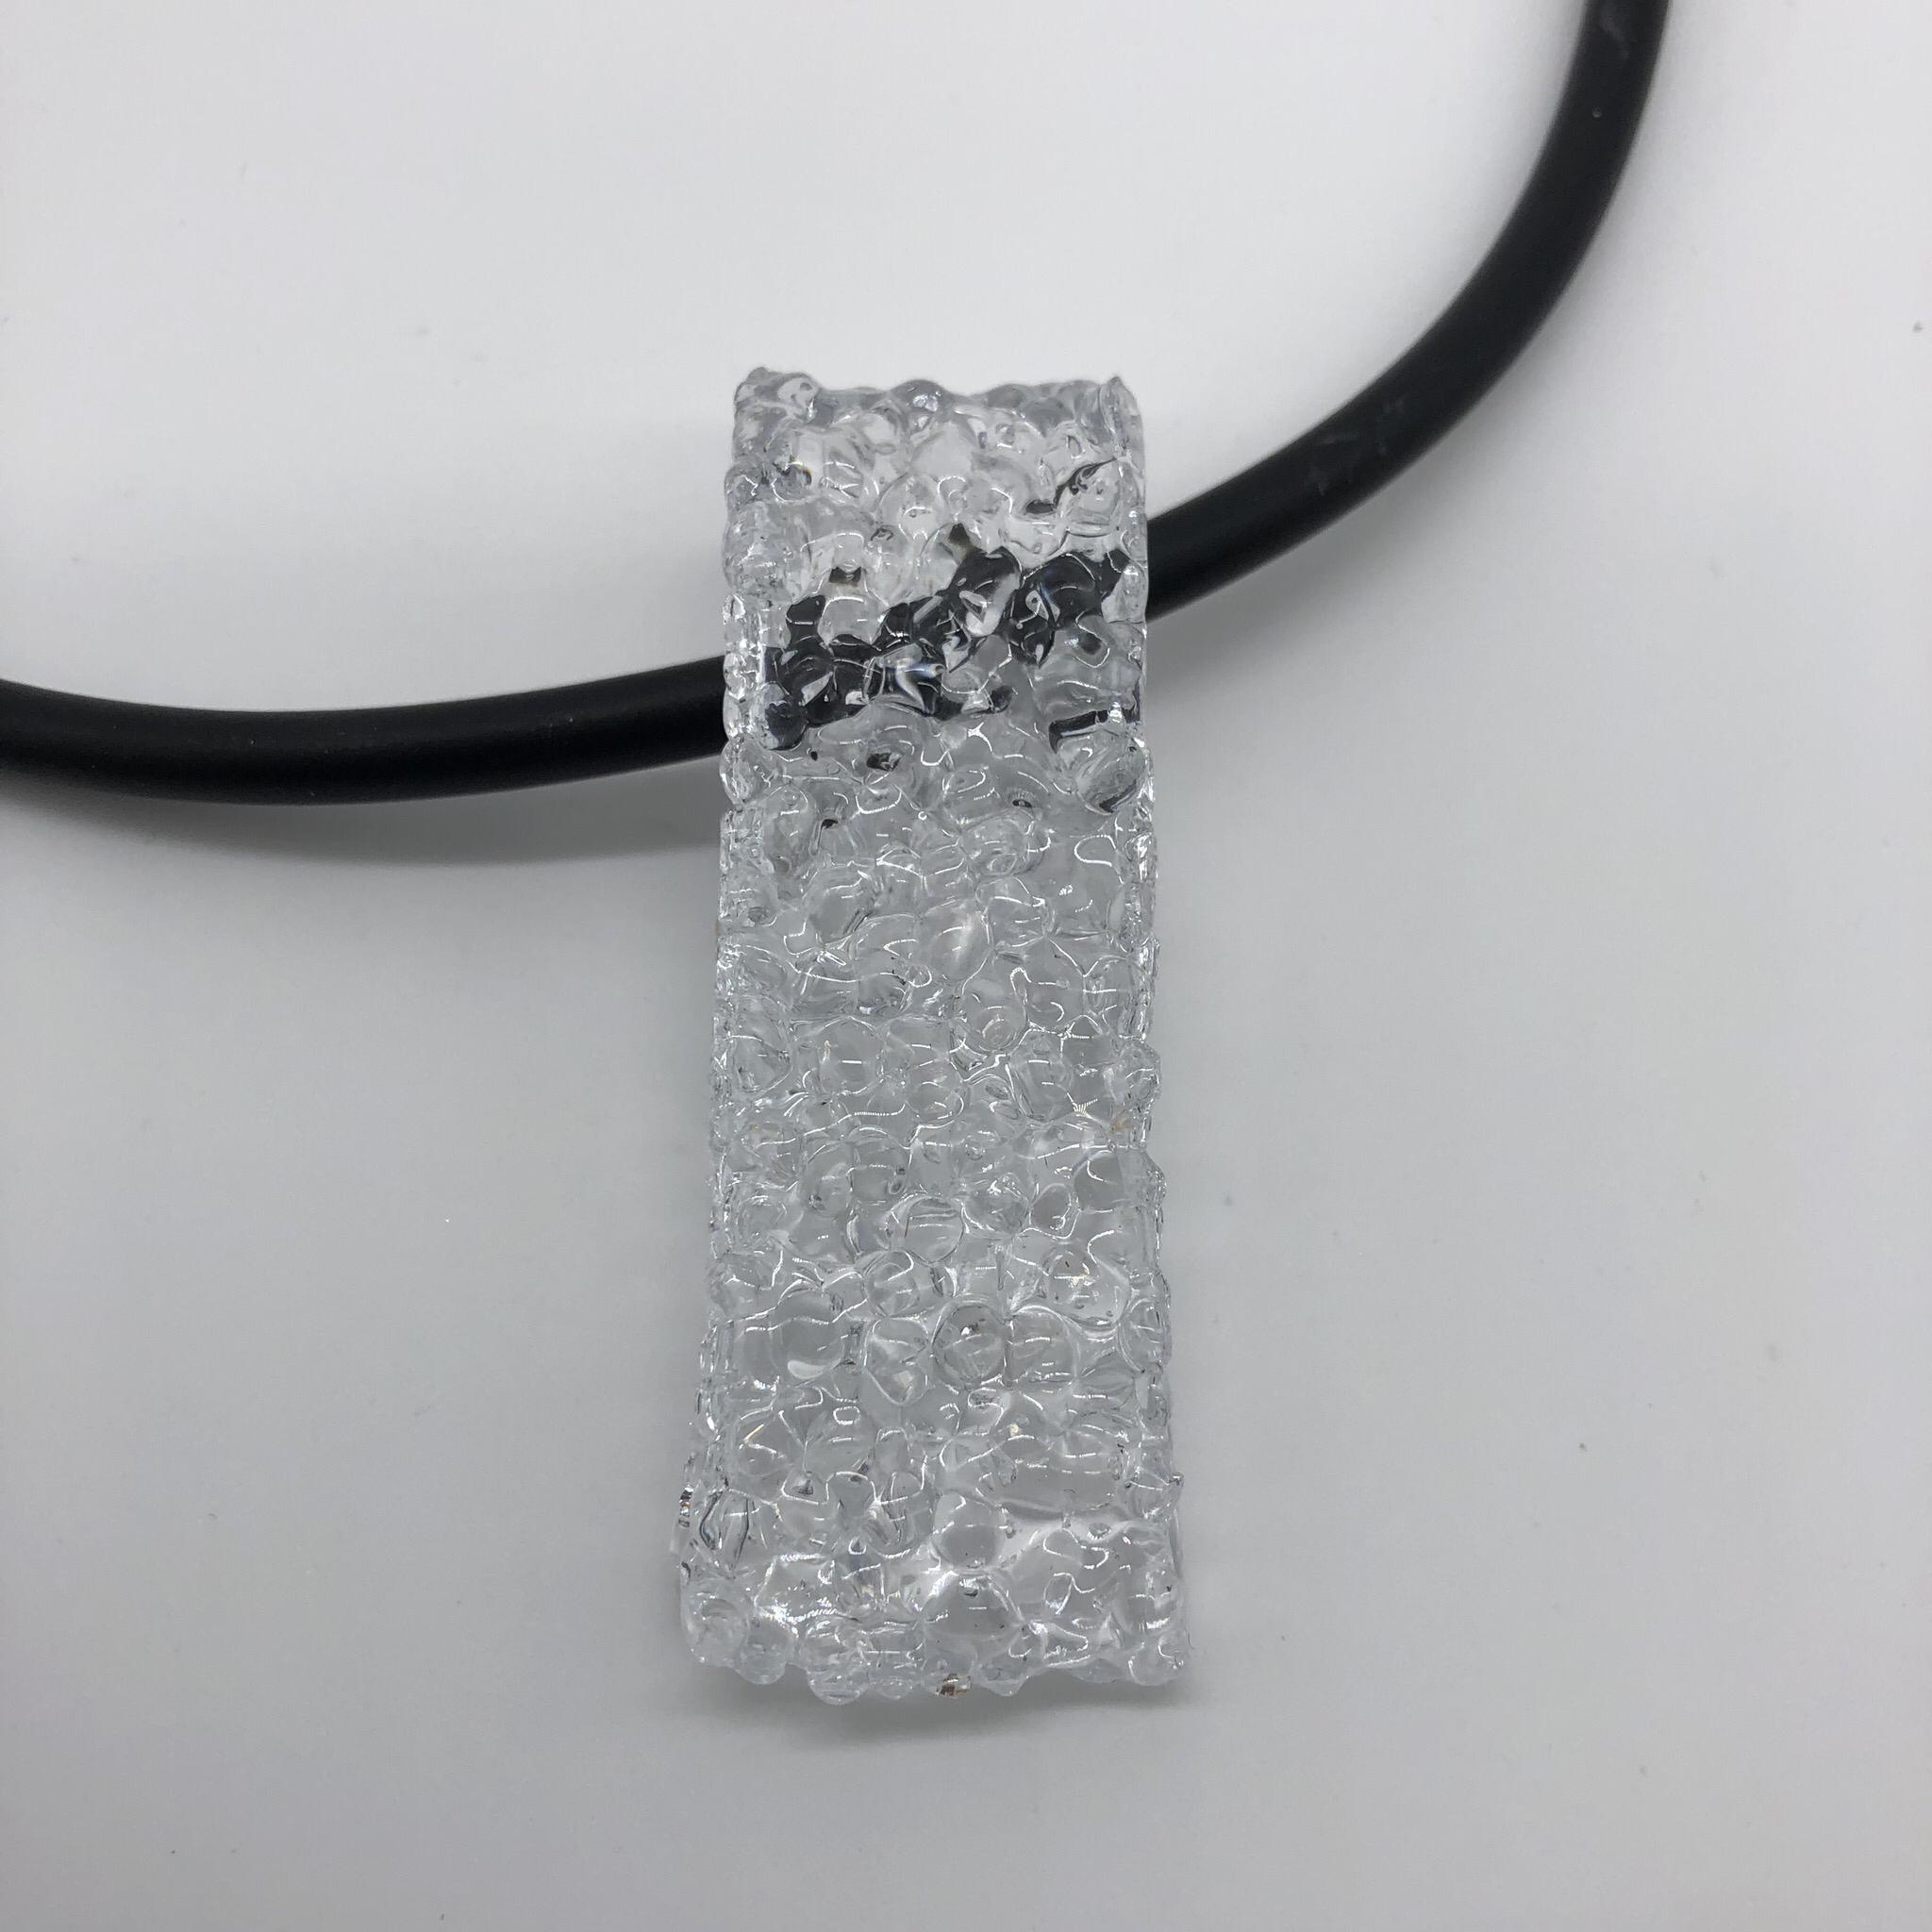 Anhänger Kunststoffgranulat transparent - beidseitig tragbar 25177